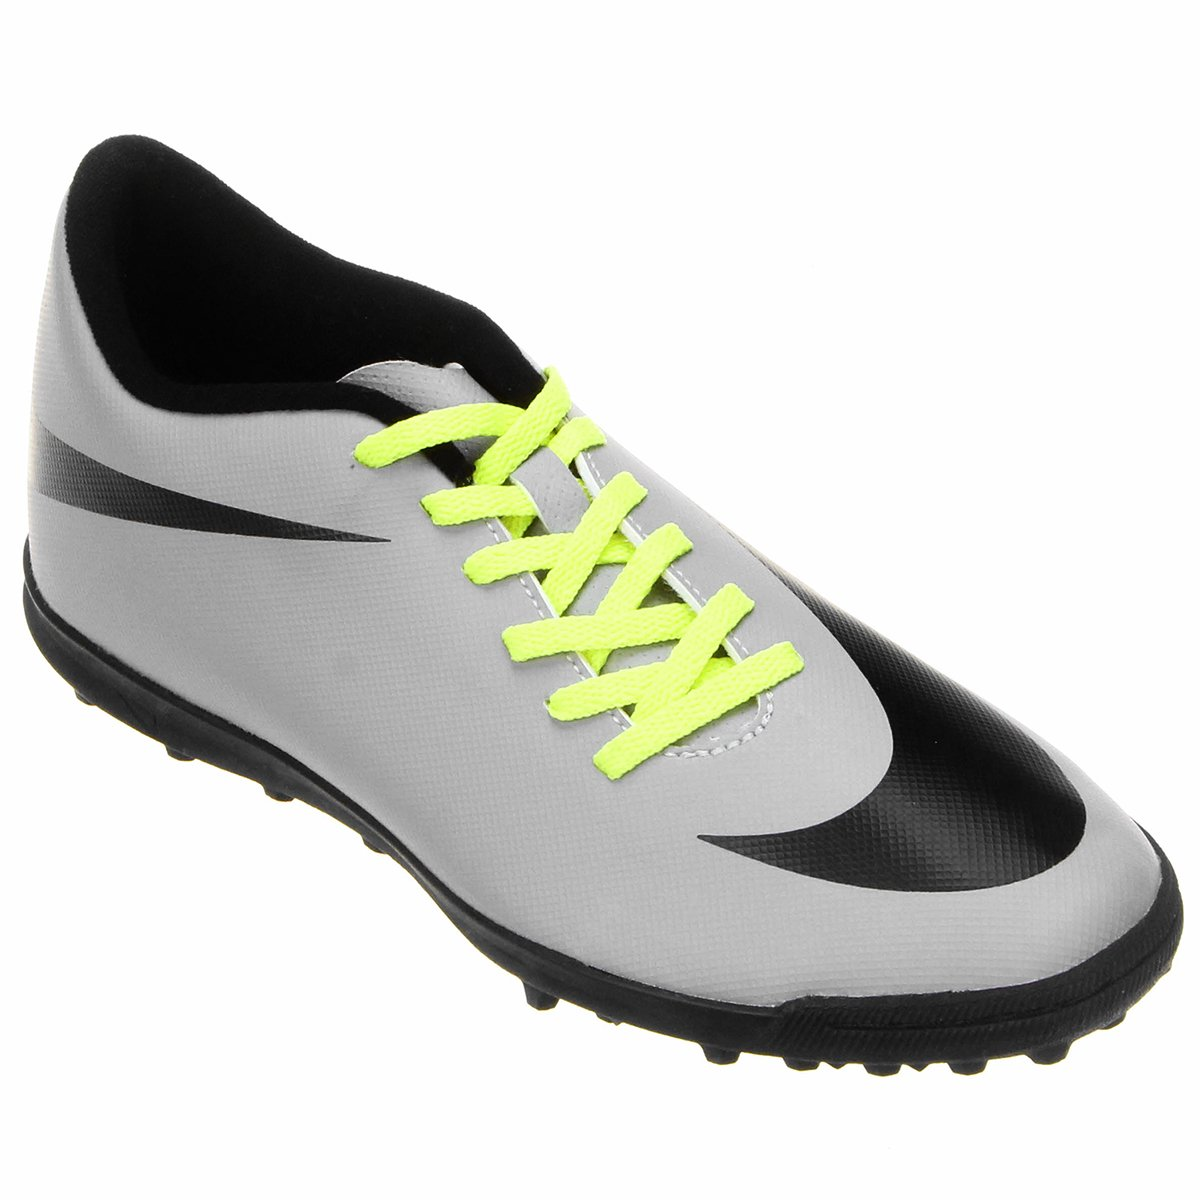 Chuteira Society Nike Bravata TF Masculina - Compre Agora  fec99fe0e42bd